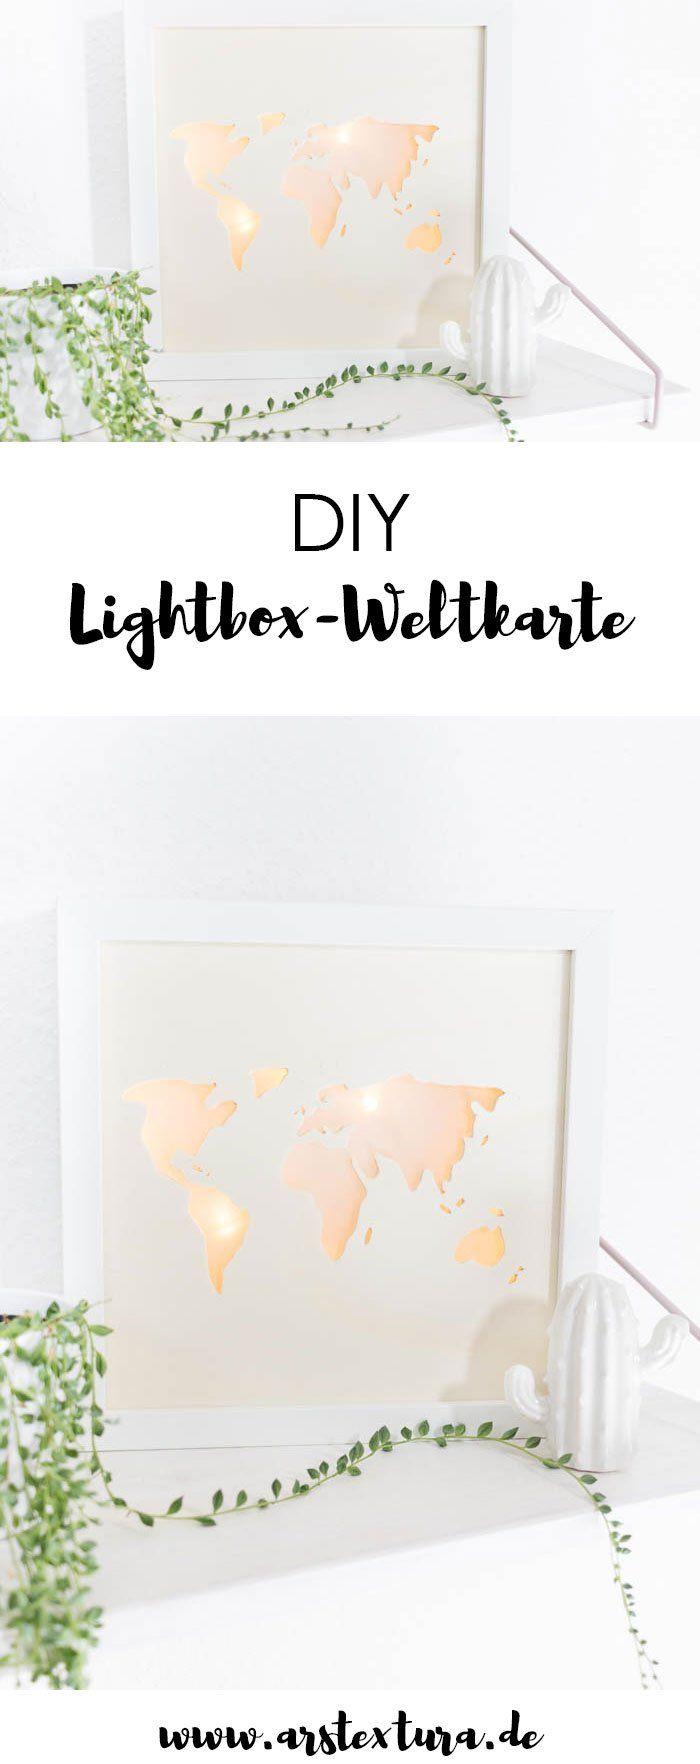 Beleuchtete Weltkarte - DIY Lightbox basteln #boyfriendgiftsdiy